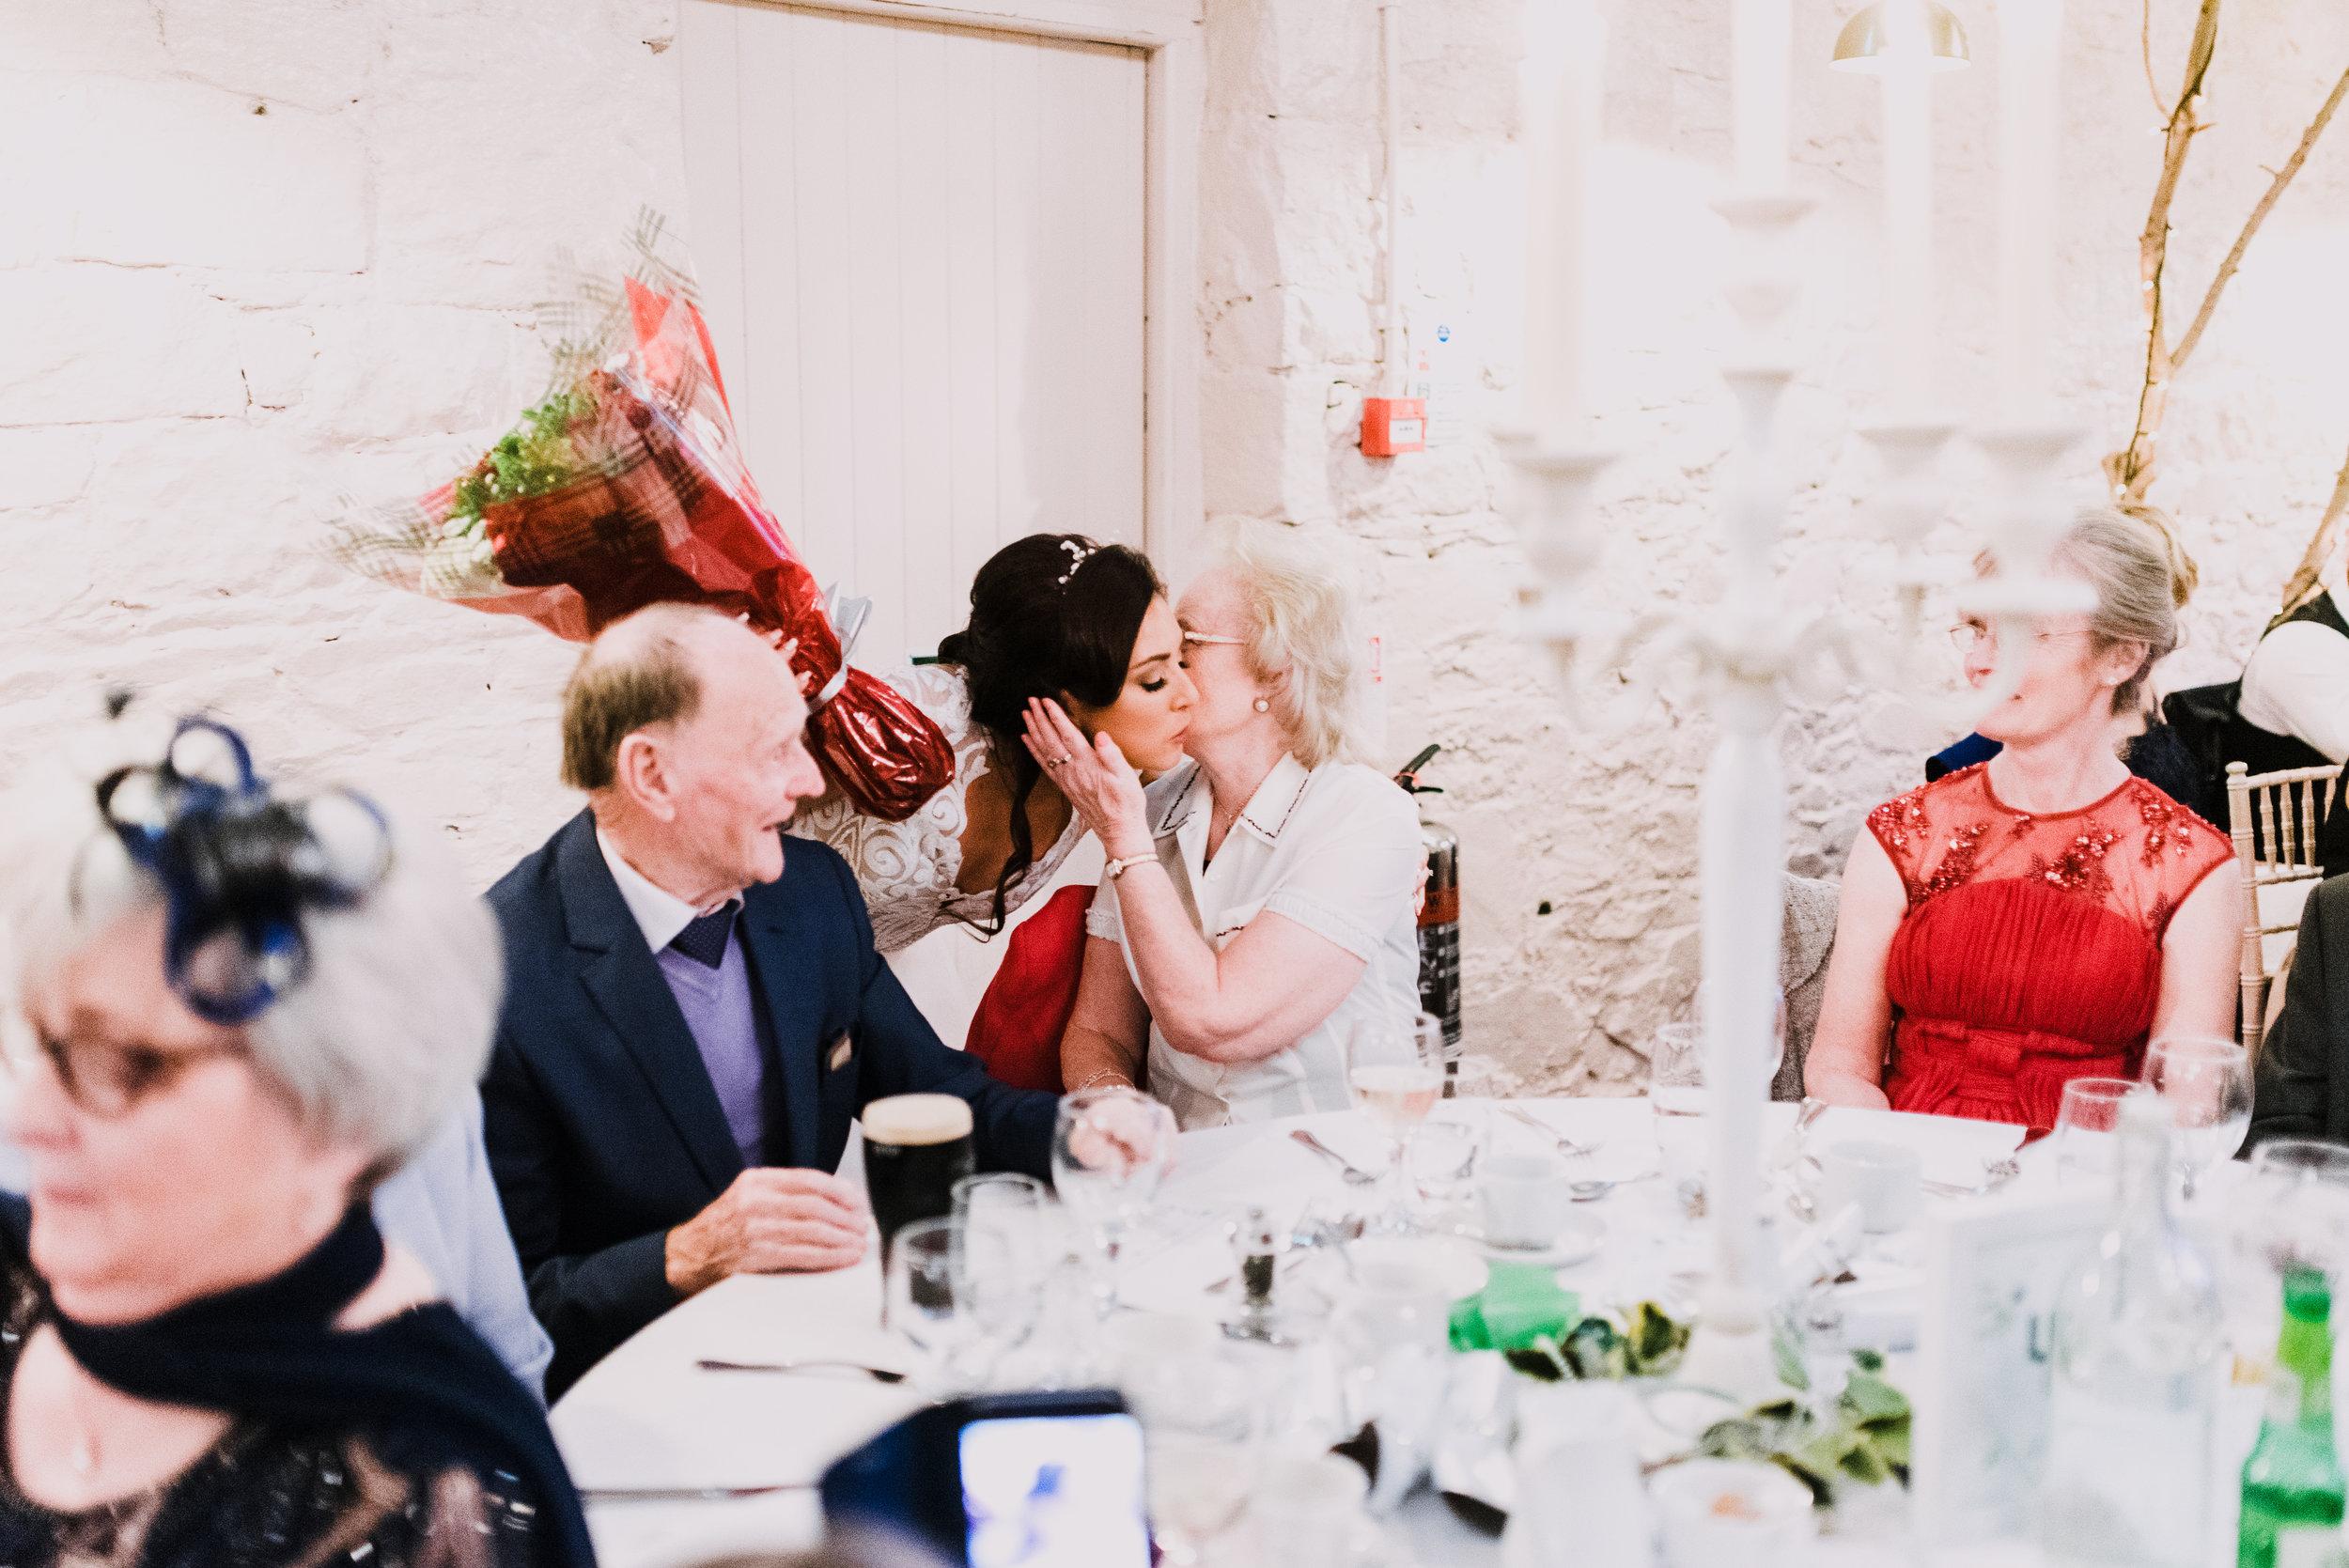 larchfield estate wedding, wedding venues northern ireland, barn wedding venues northern ireland, wedding photos larchfield estate, shane todd wedding, larchfield wedding decor ideas (15).jpg